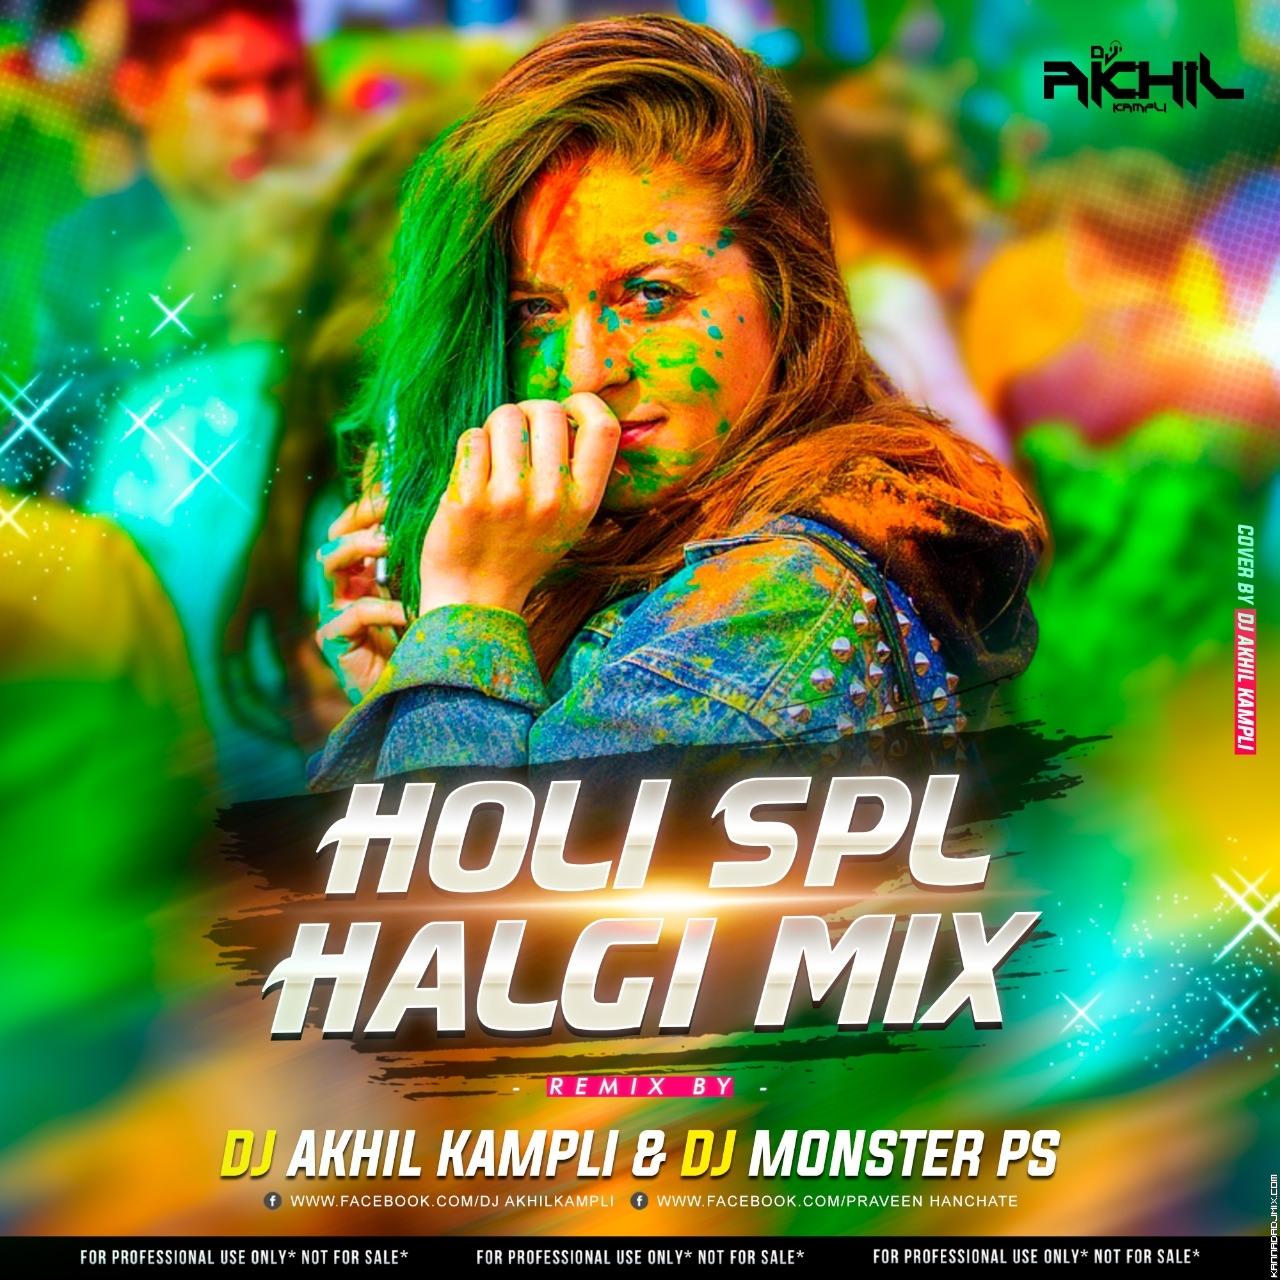 Holi Spl (Halgi Mix) Dj Akhil Kampli & Dj Monster PS.mp3